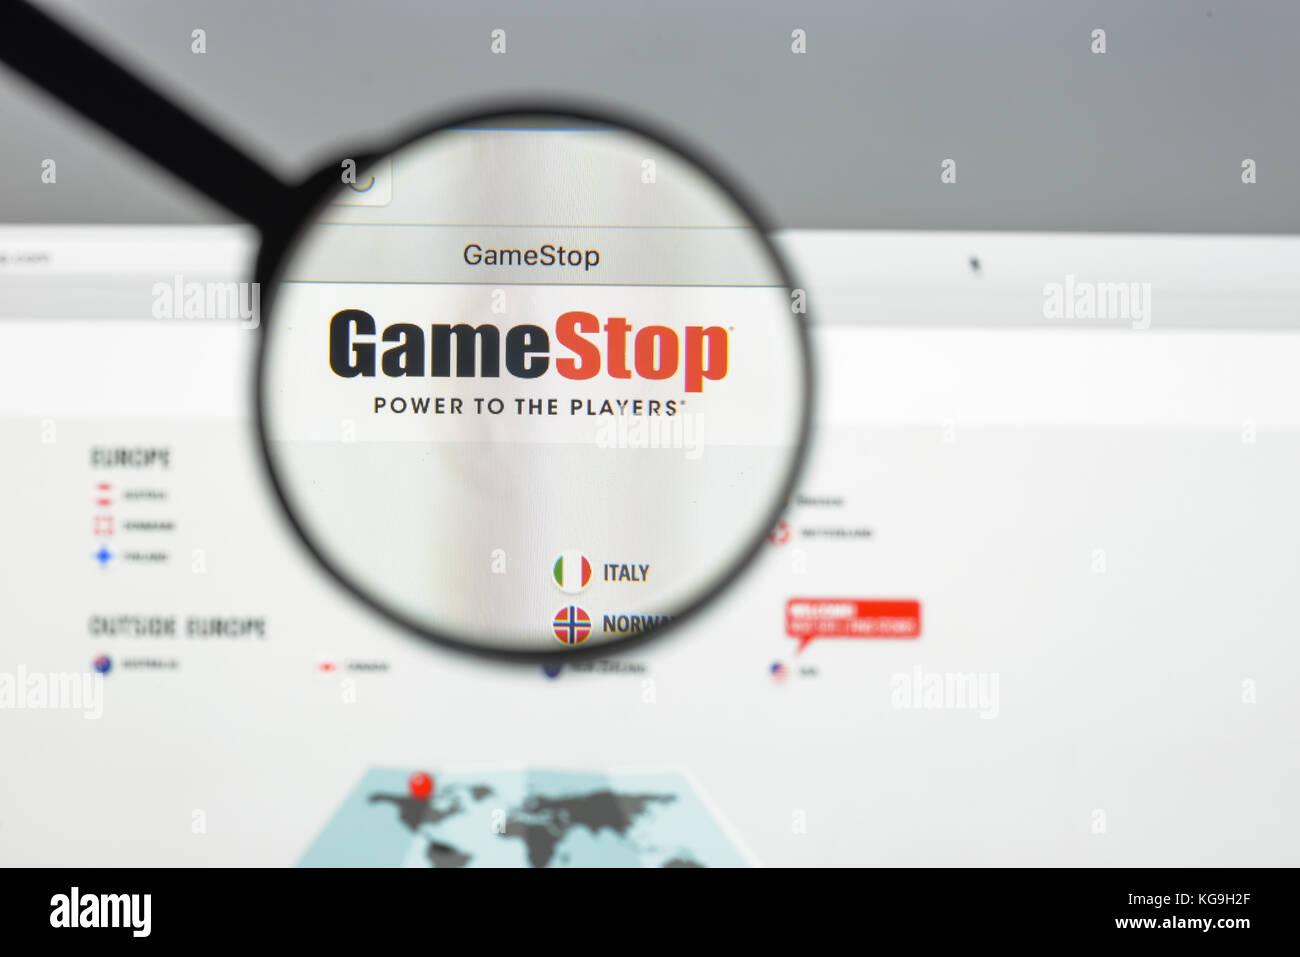 Gamestop Store Stock Photos & Gamestop Store Stock Images - Alamy